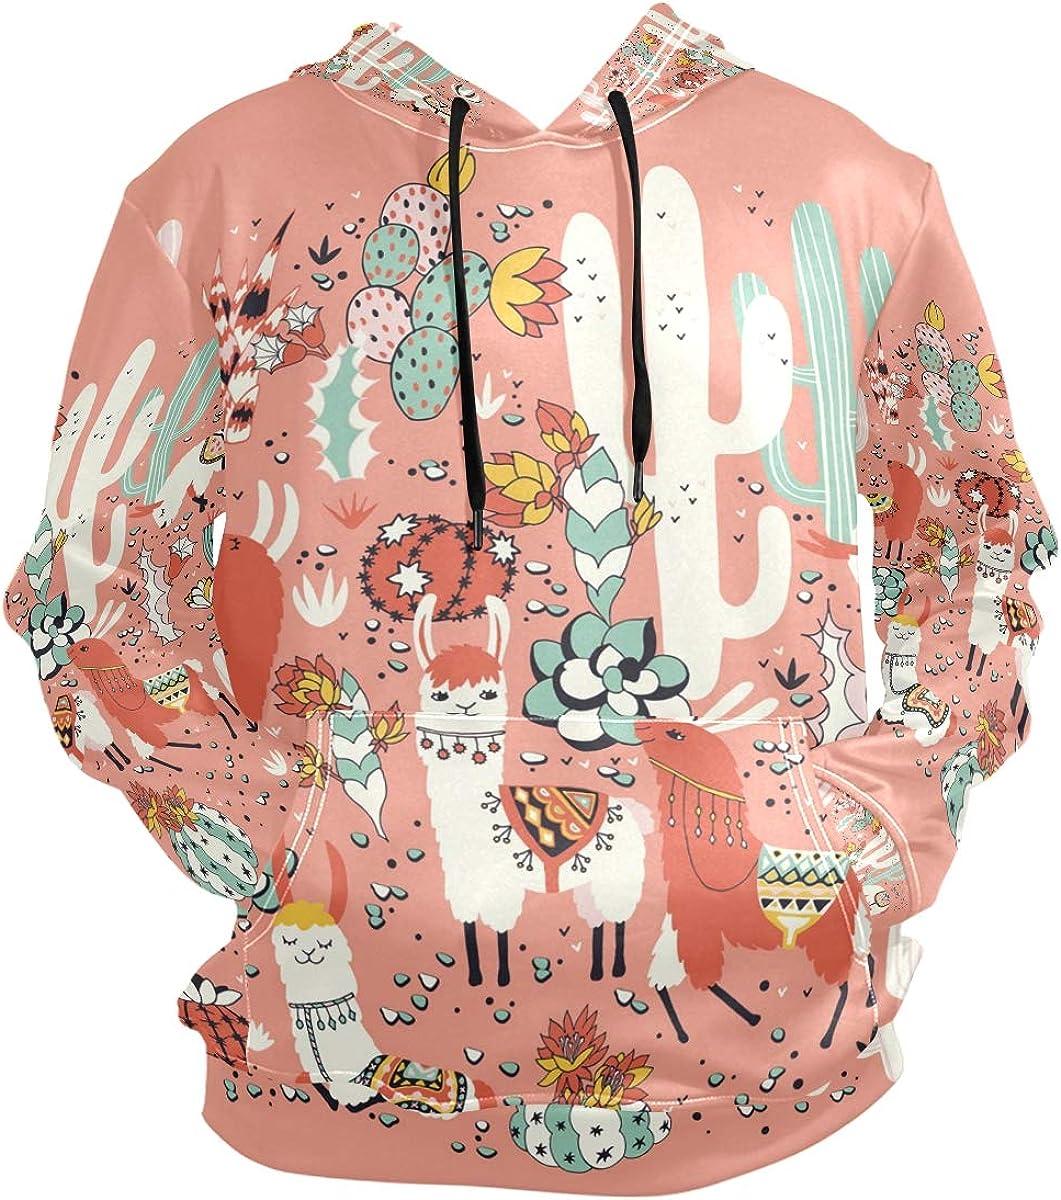 Mens Novelty Hoodies Fashion Happy Alaskan Malamute Print Long Sleeve Pullover Hooded Sweatshirt with Pocket